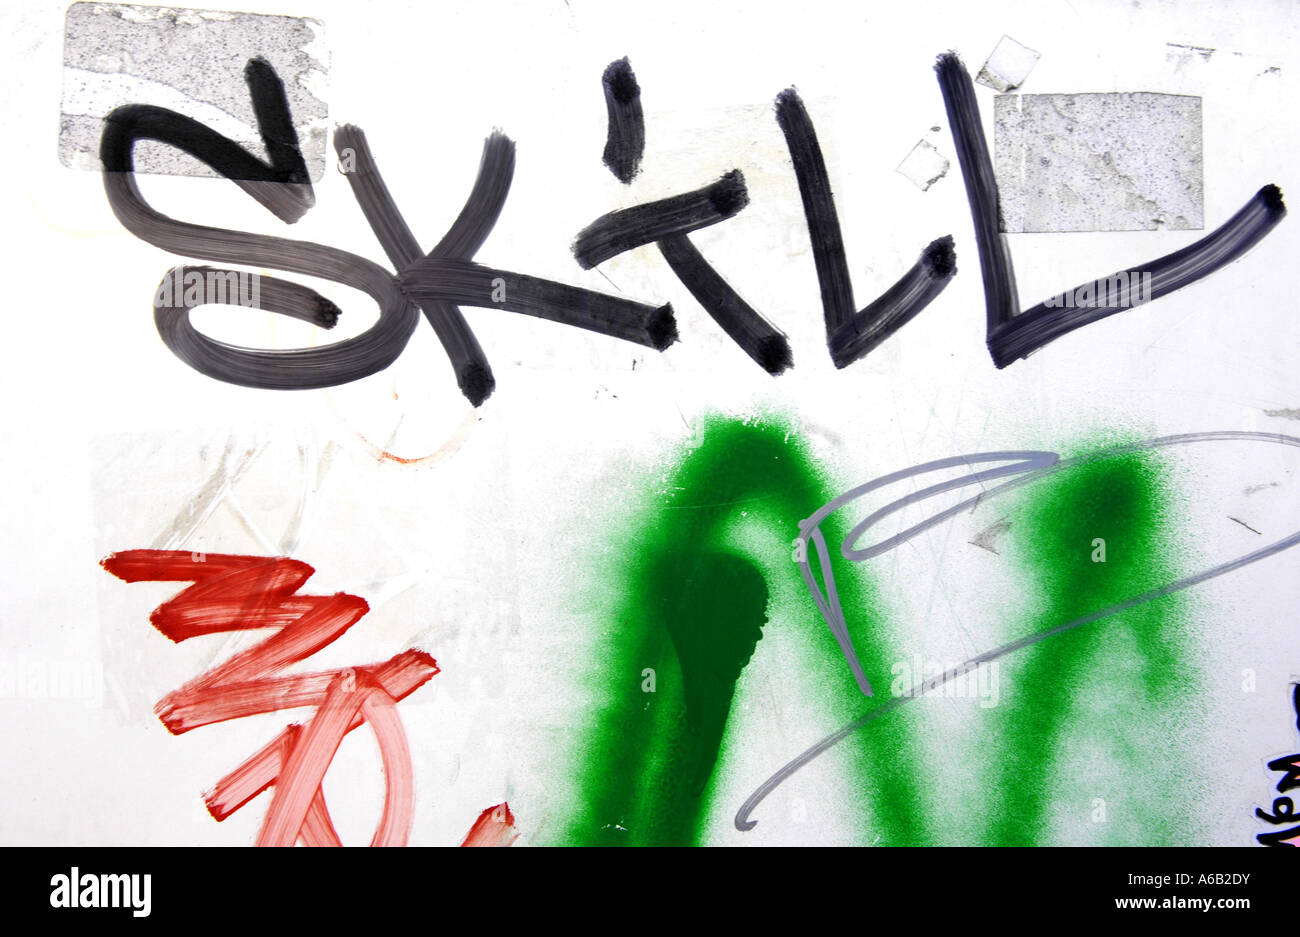 skill name